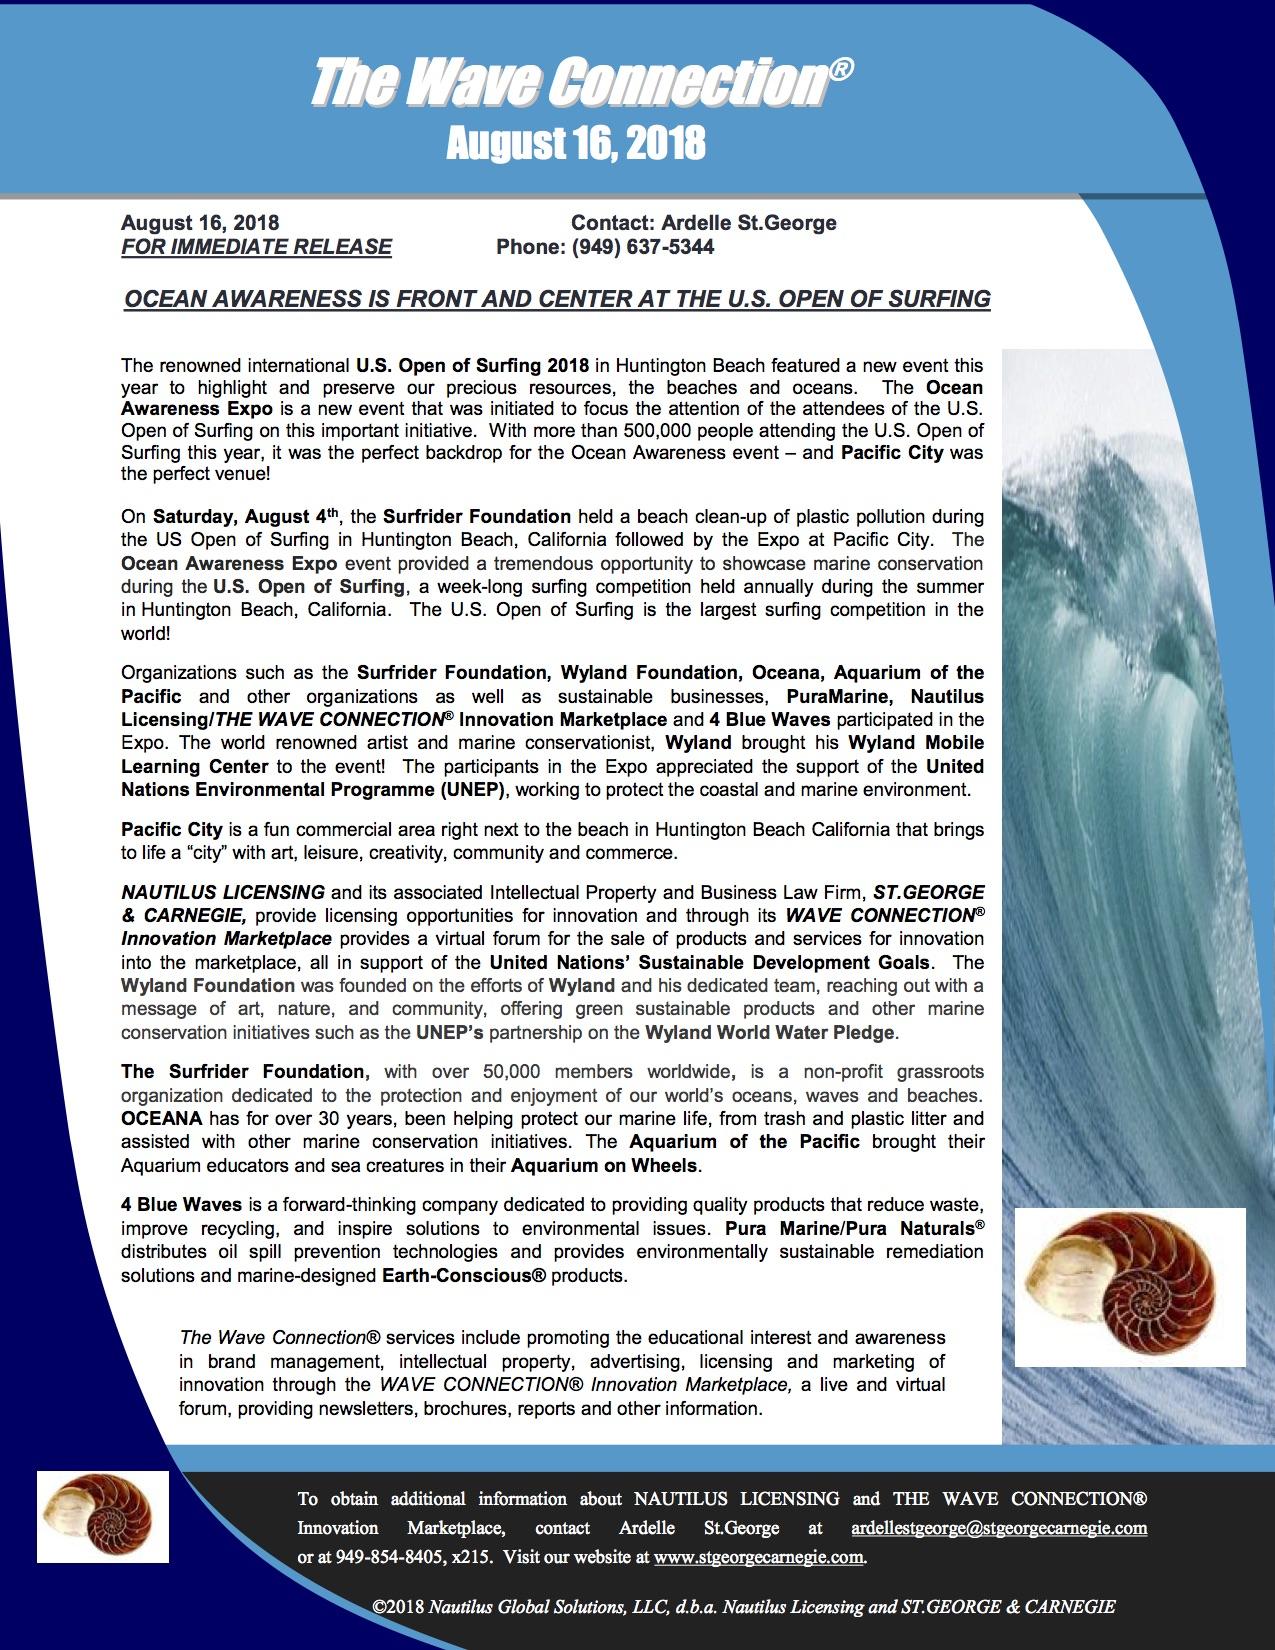 wave connection ocean awareness press releasepdf - 180816